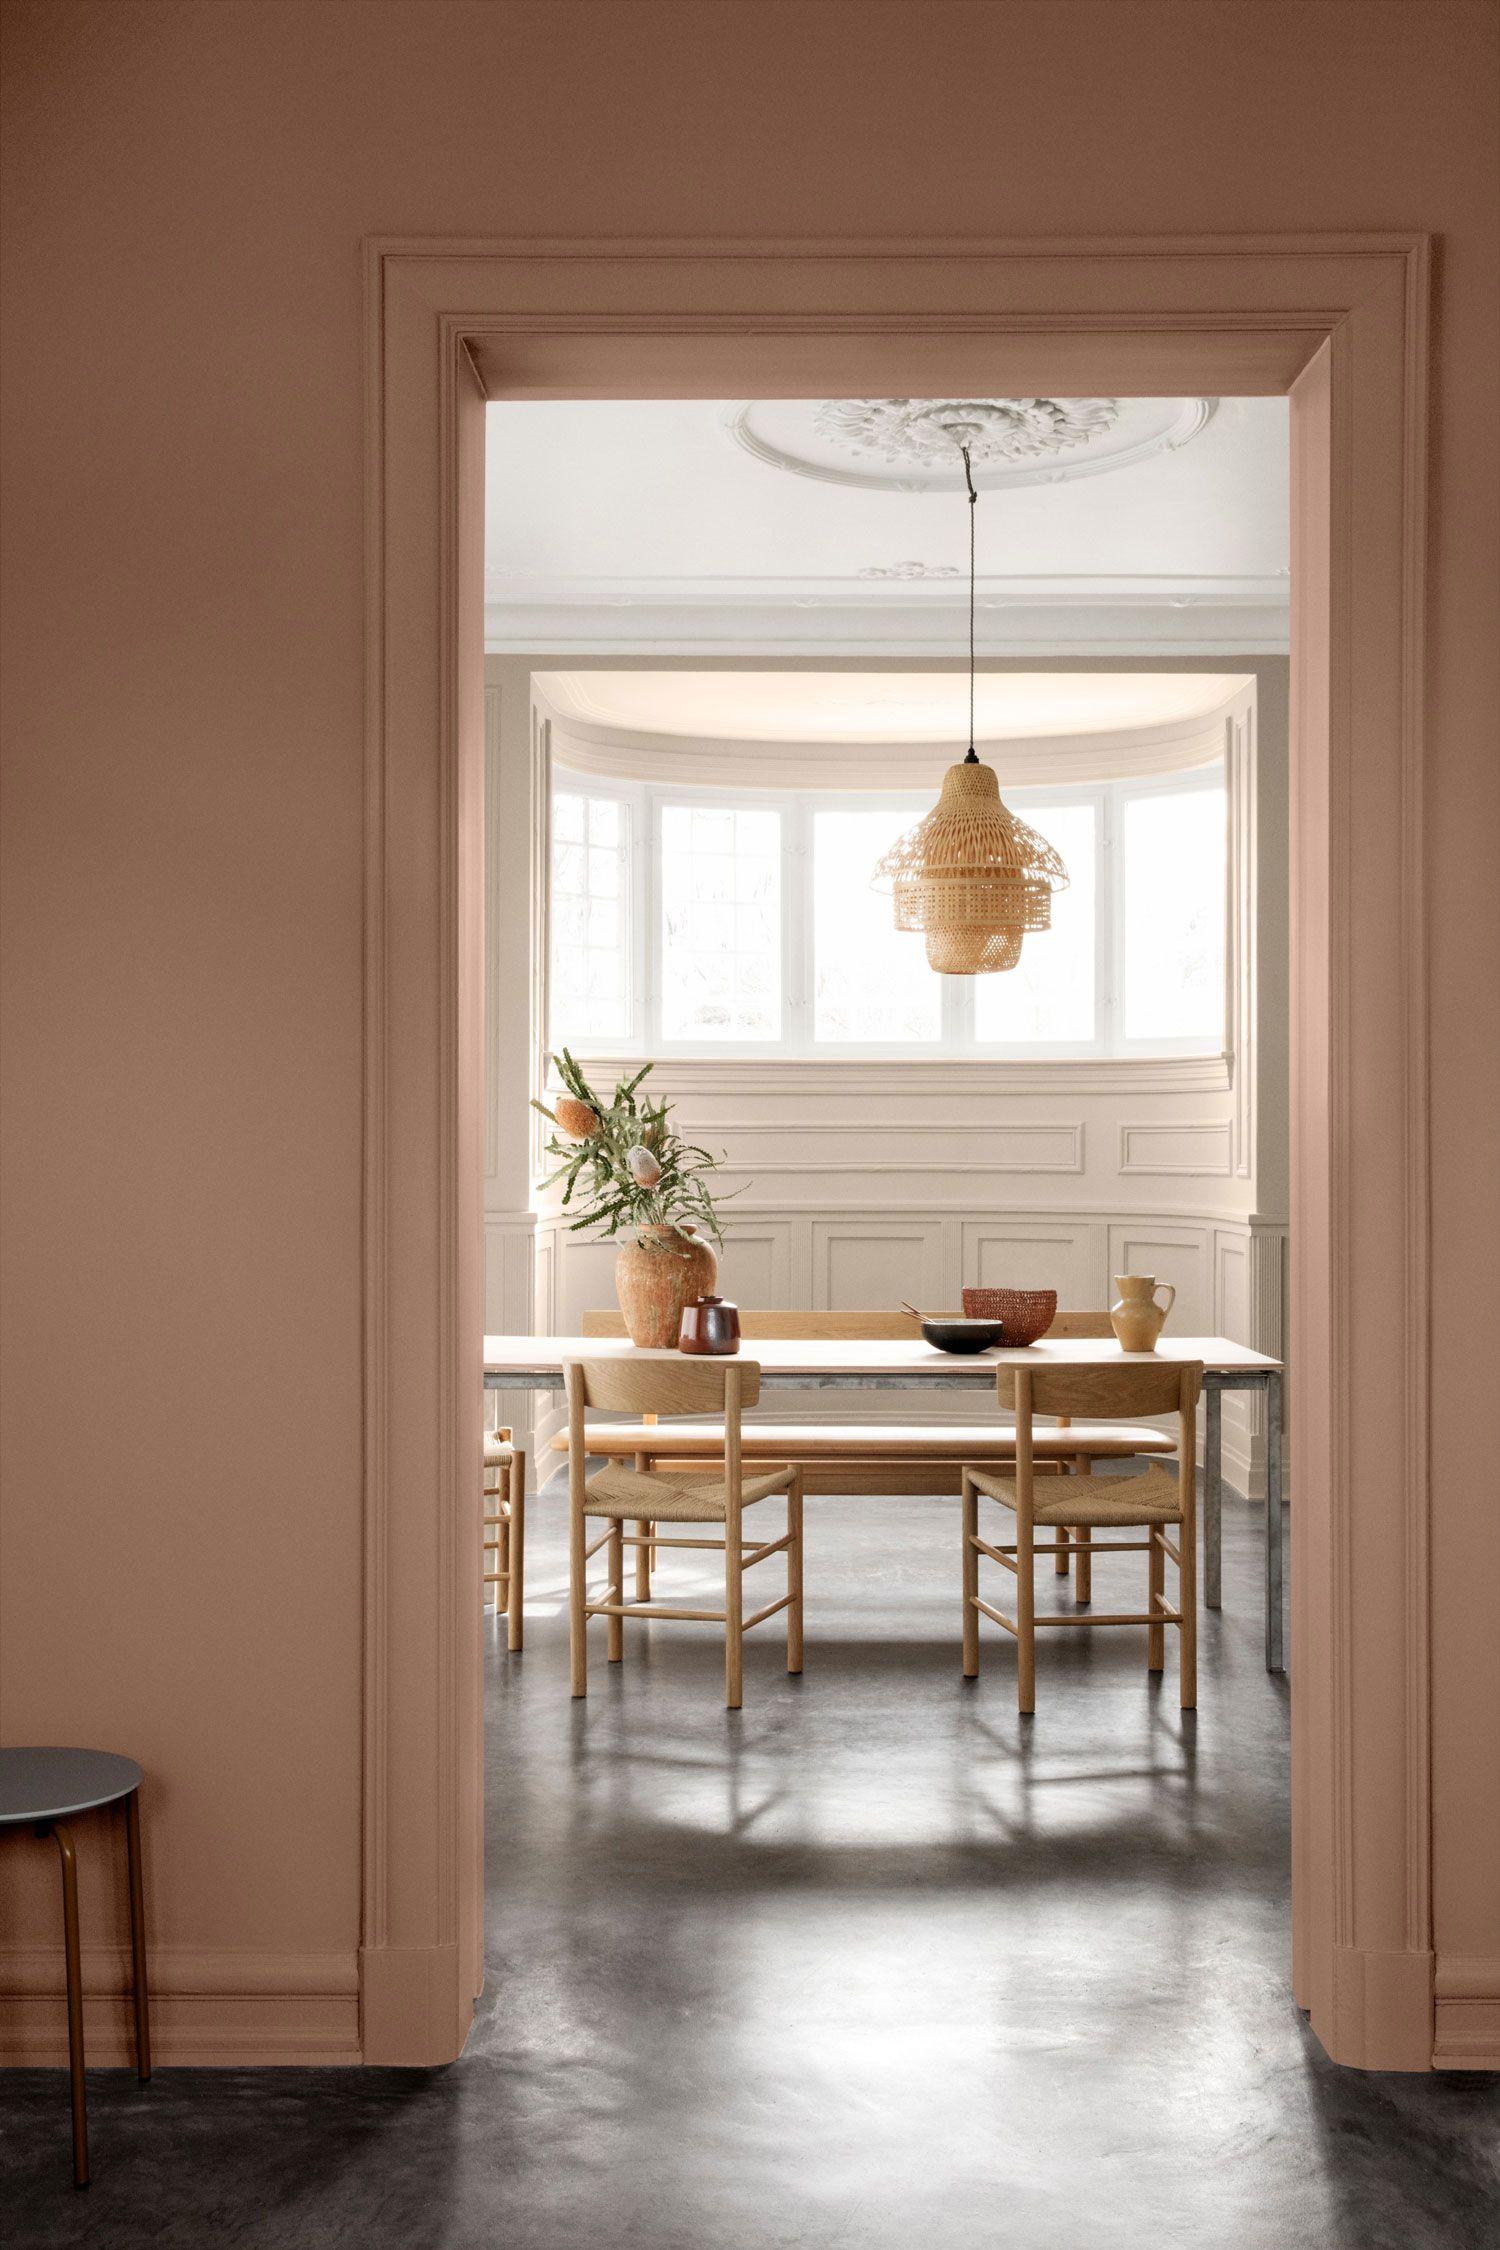 Home interior colour rhythm of life jotun identifies interior colour trends